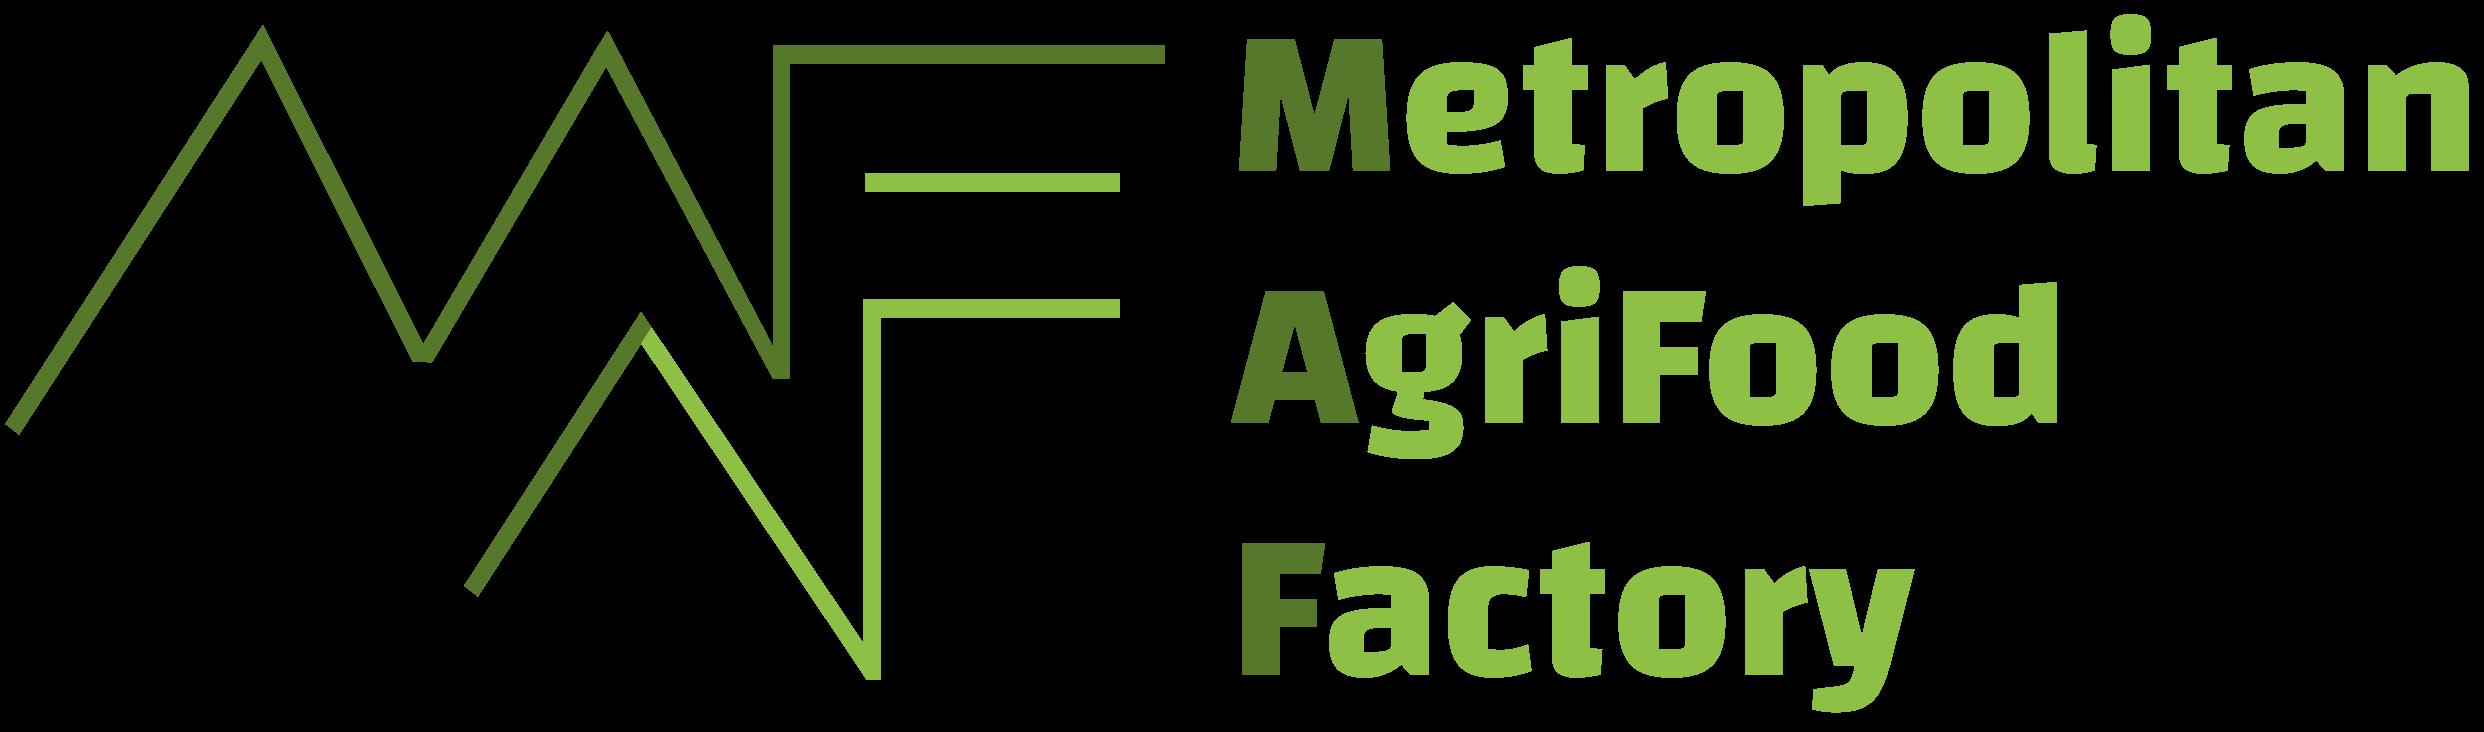 Metropolitan Agrifood Factory